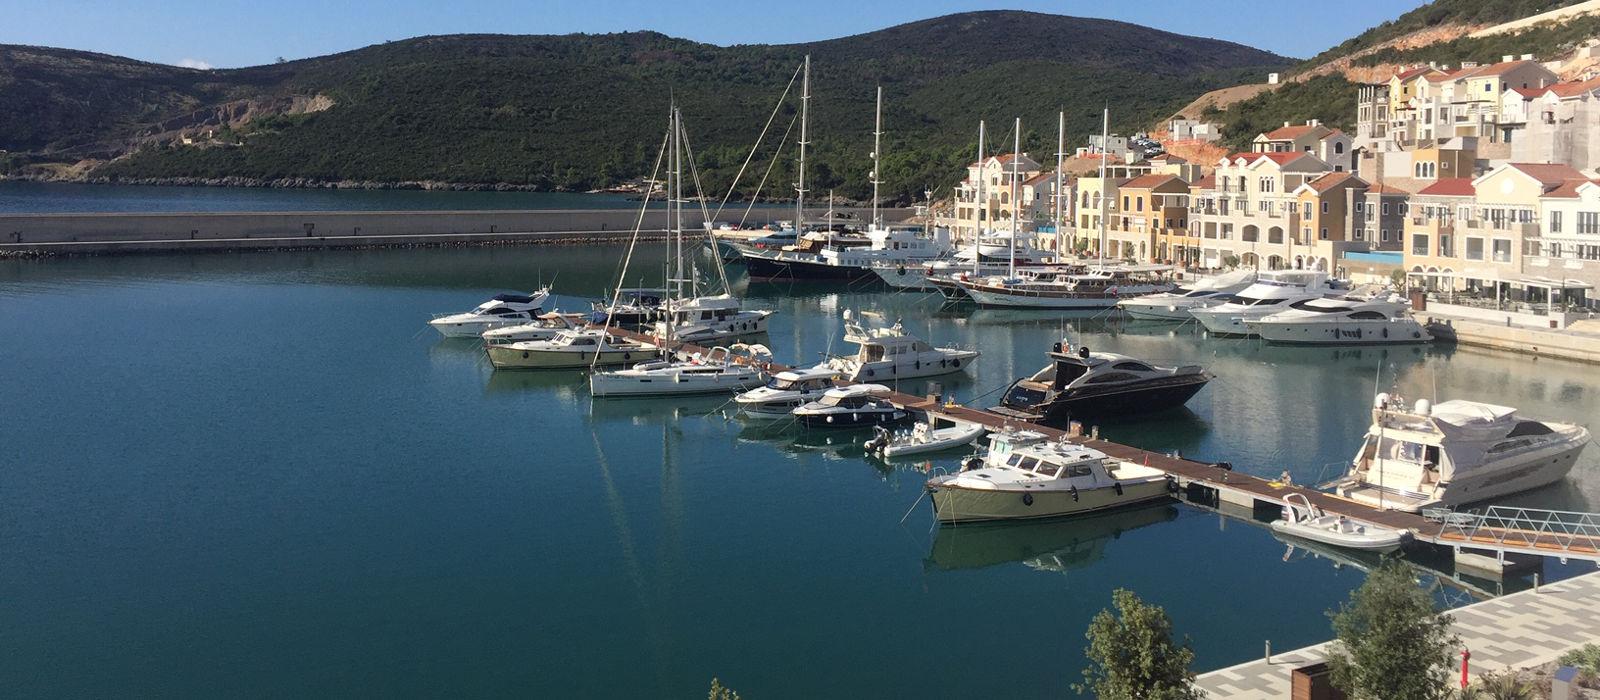 The Chedi Lustica Bay Montenegro, Luxushotel Montenegro